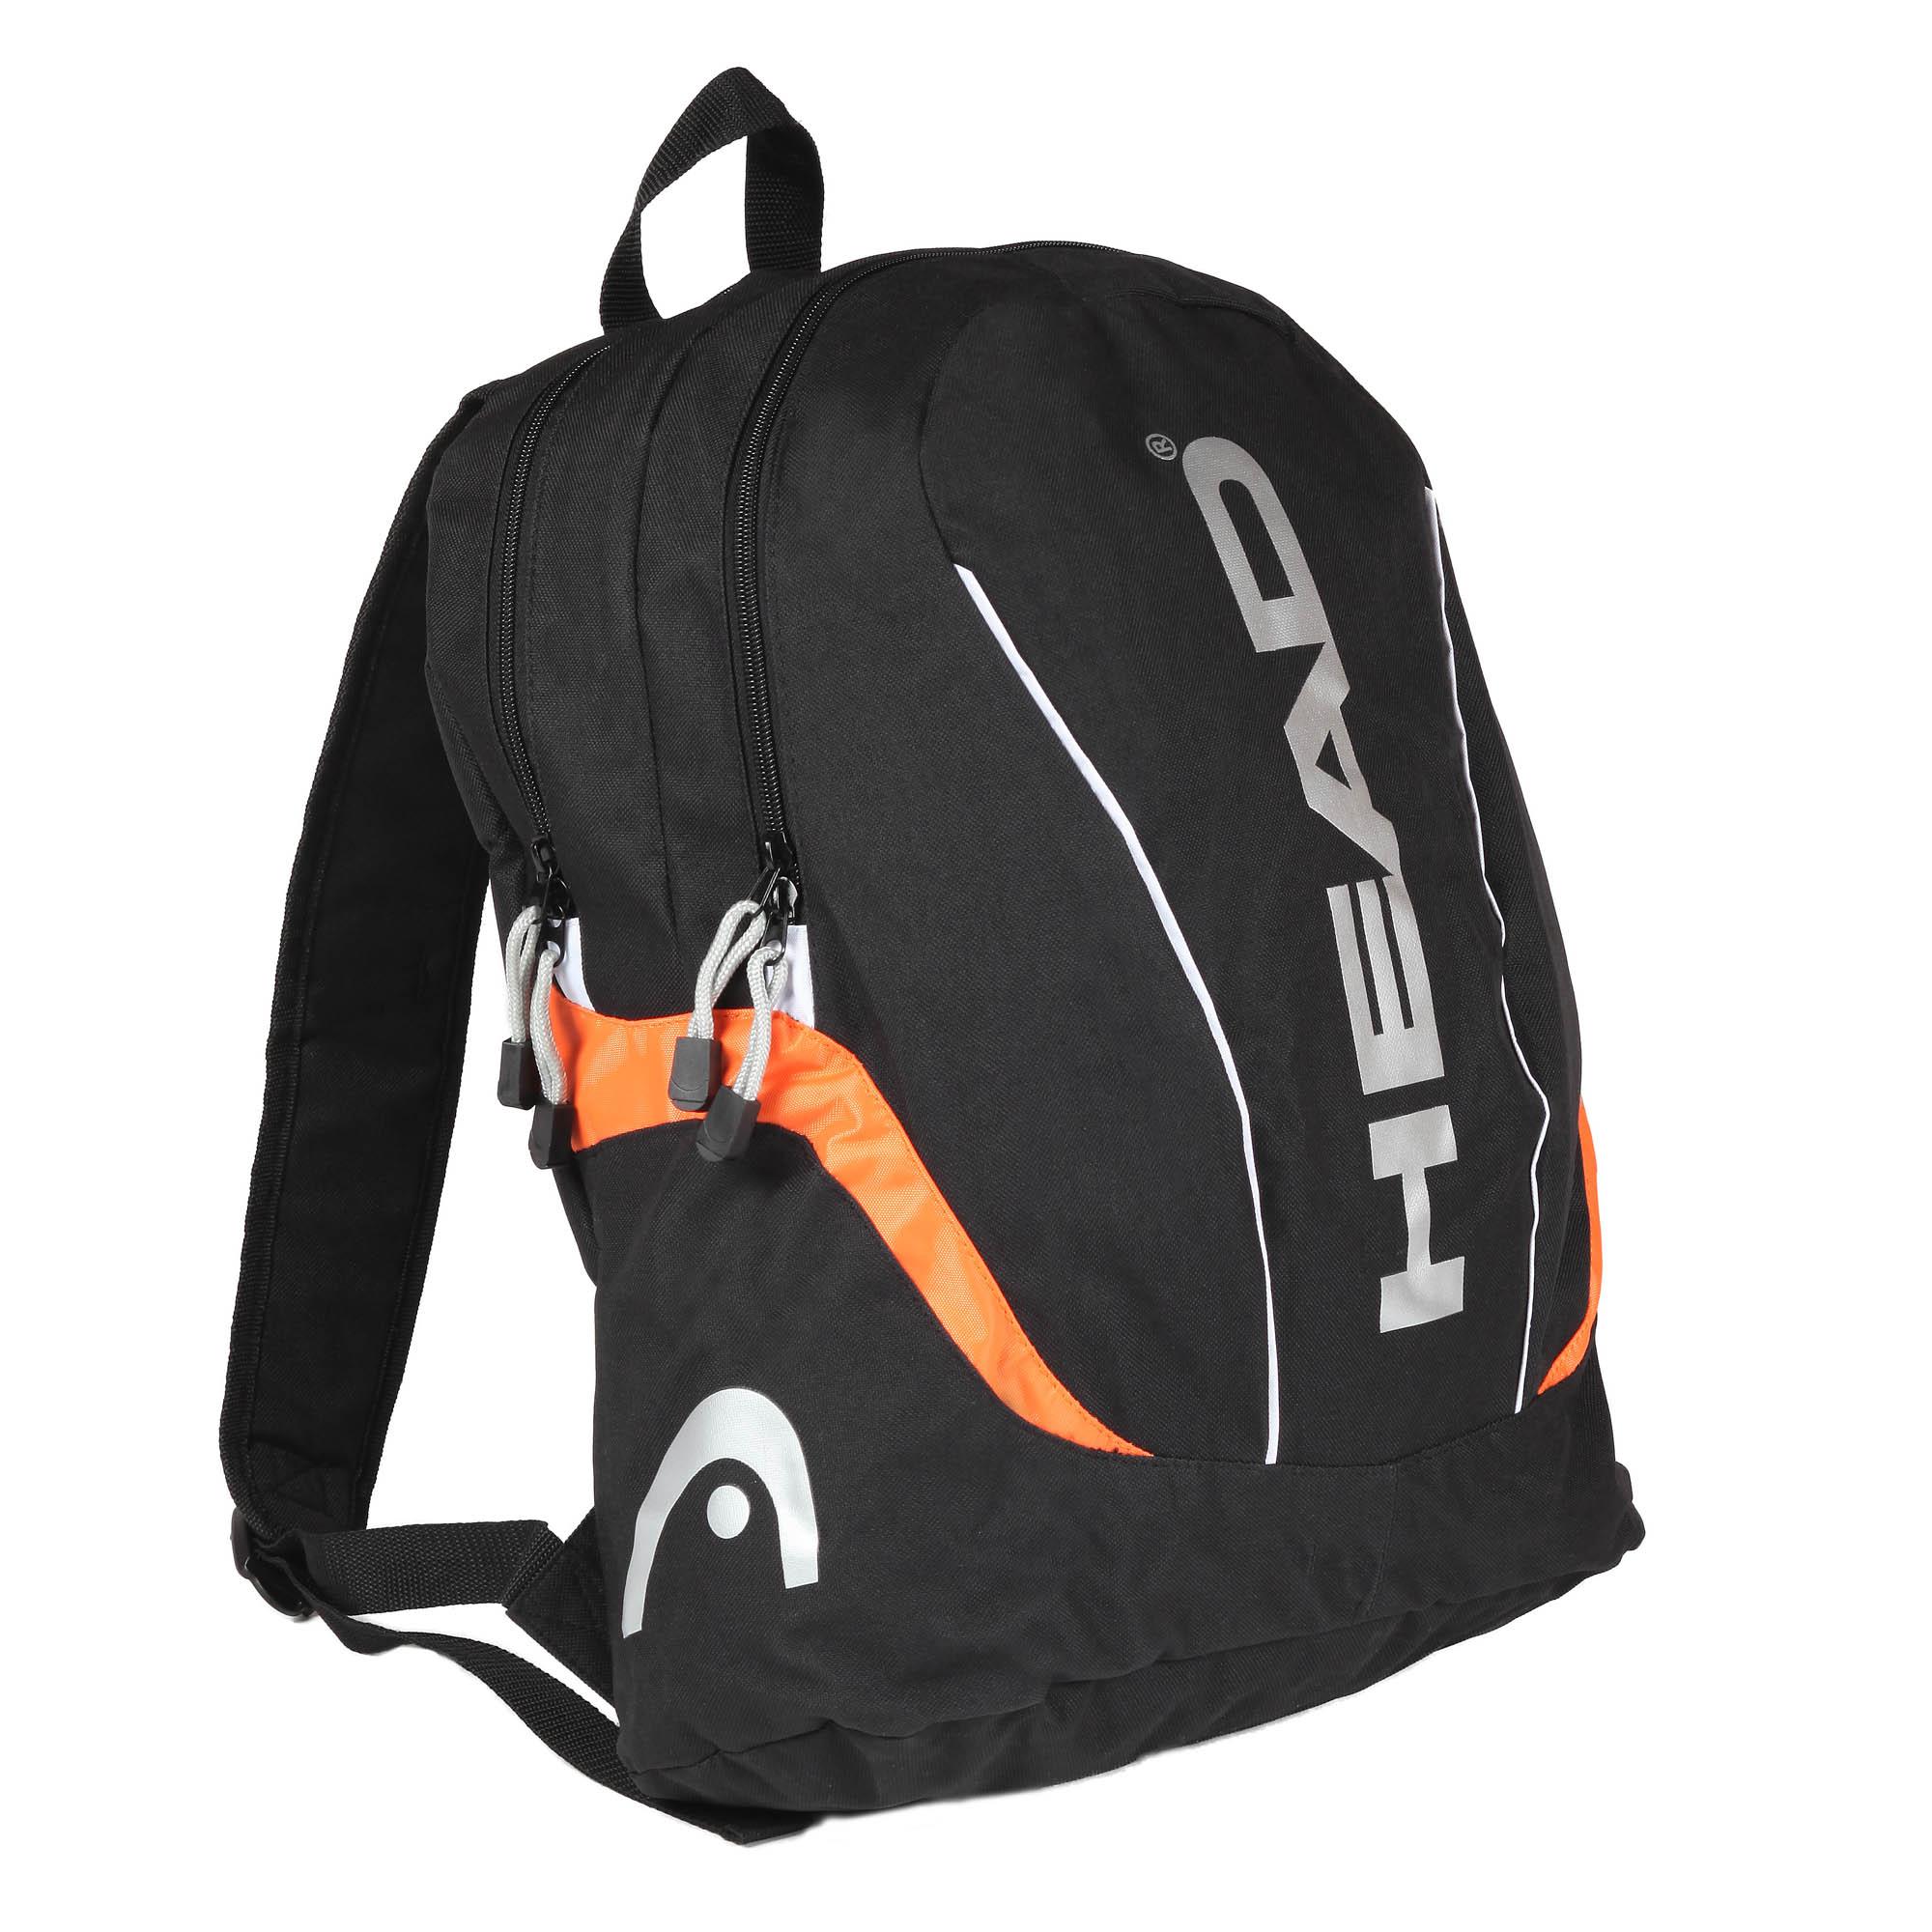 Head Centaur Backpack - Black